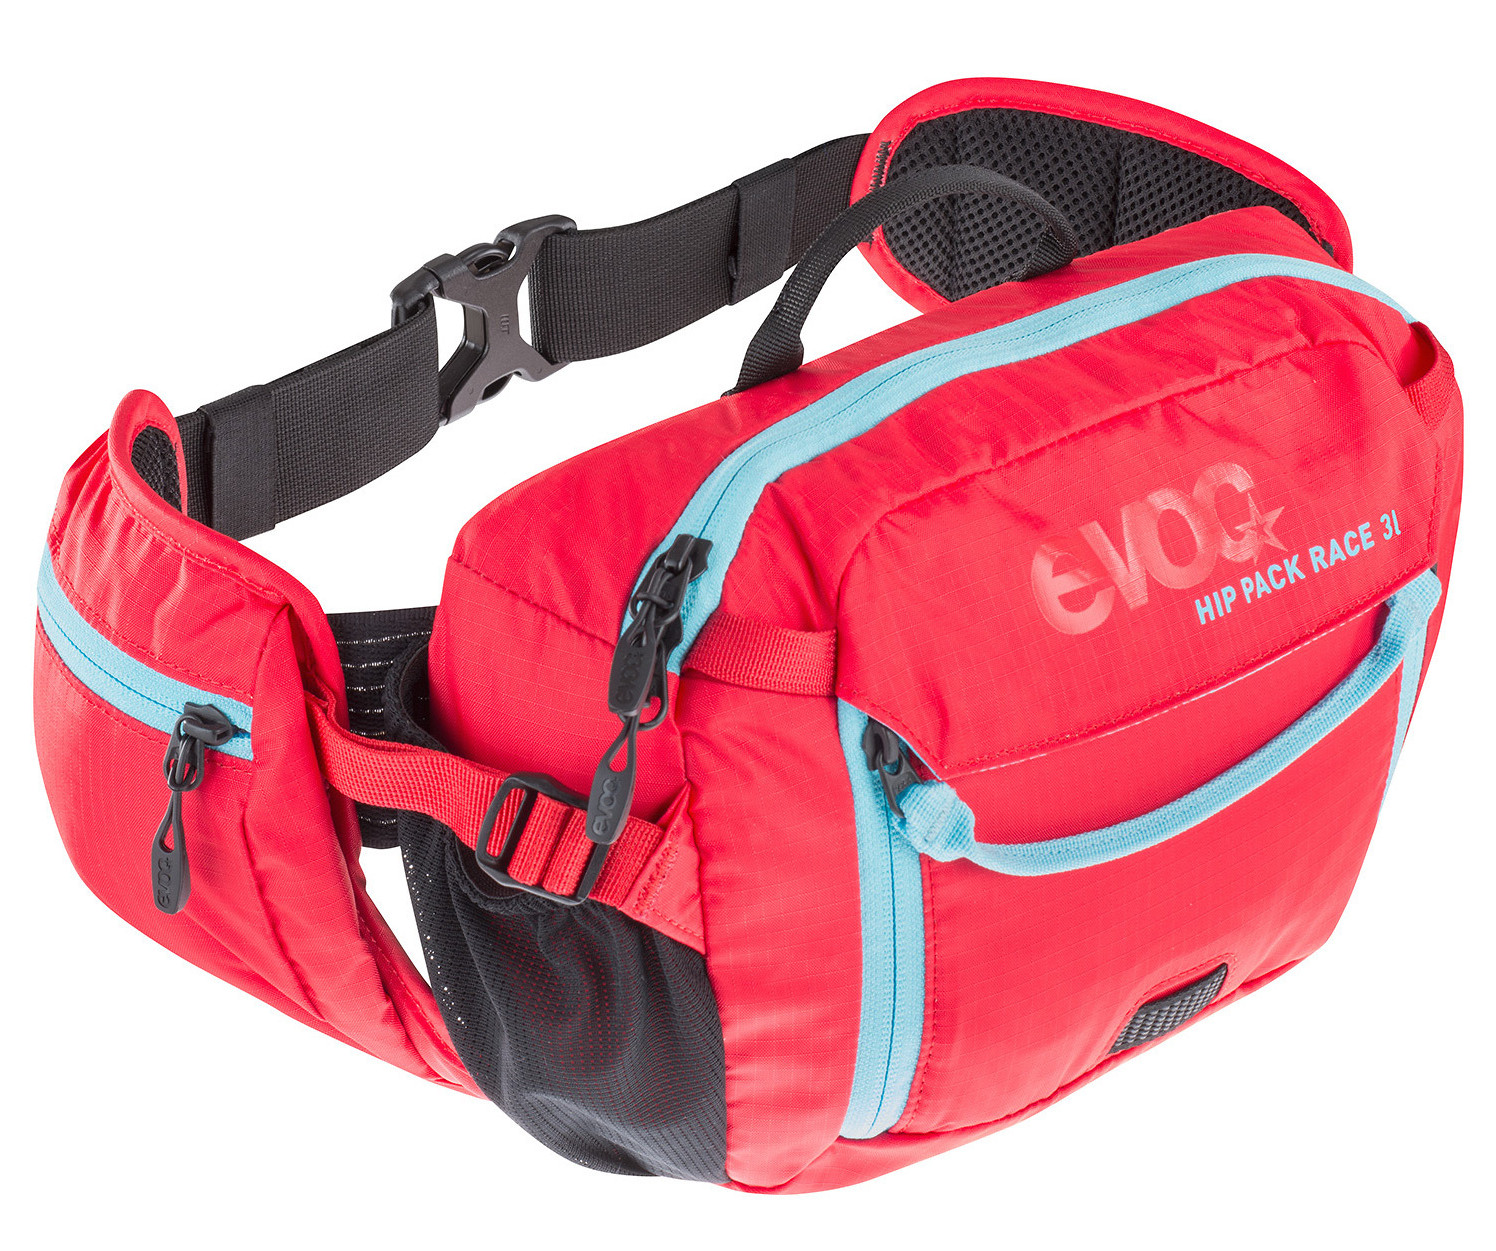 Evoc Hip Pack Race 3L (red/neon blue)